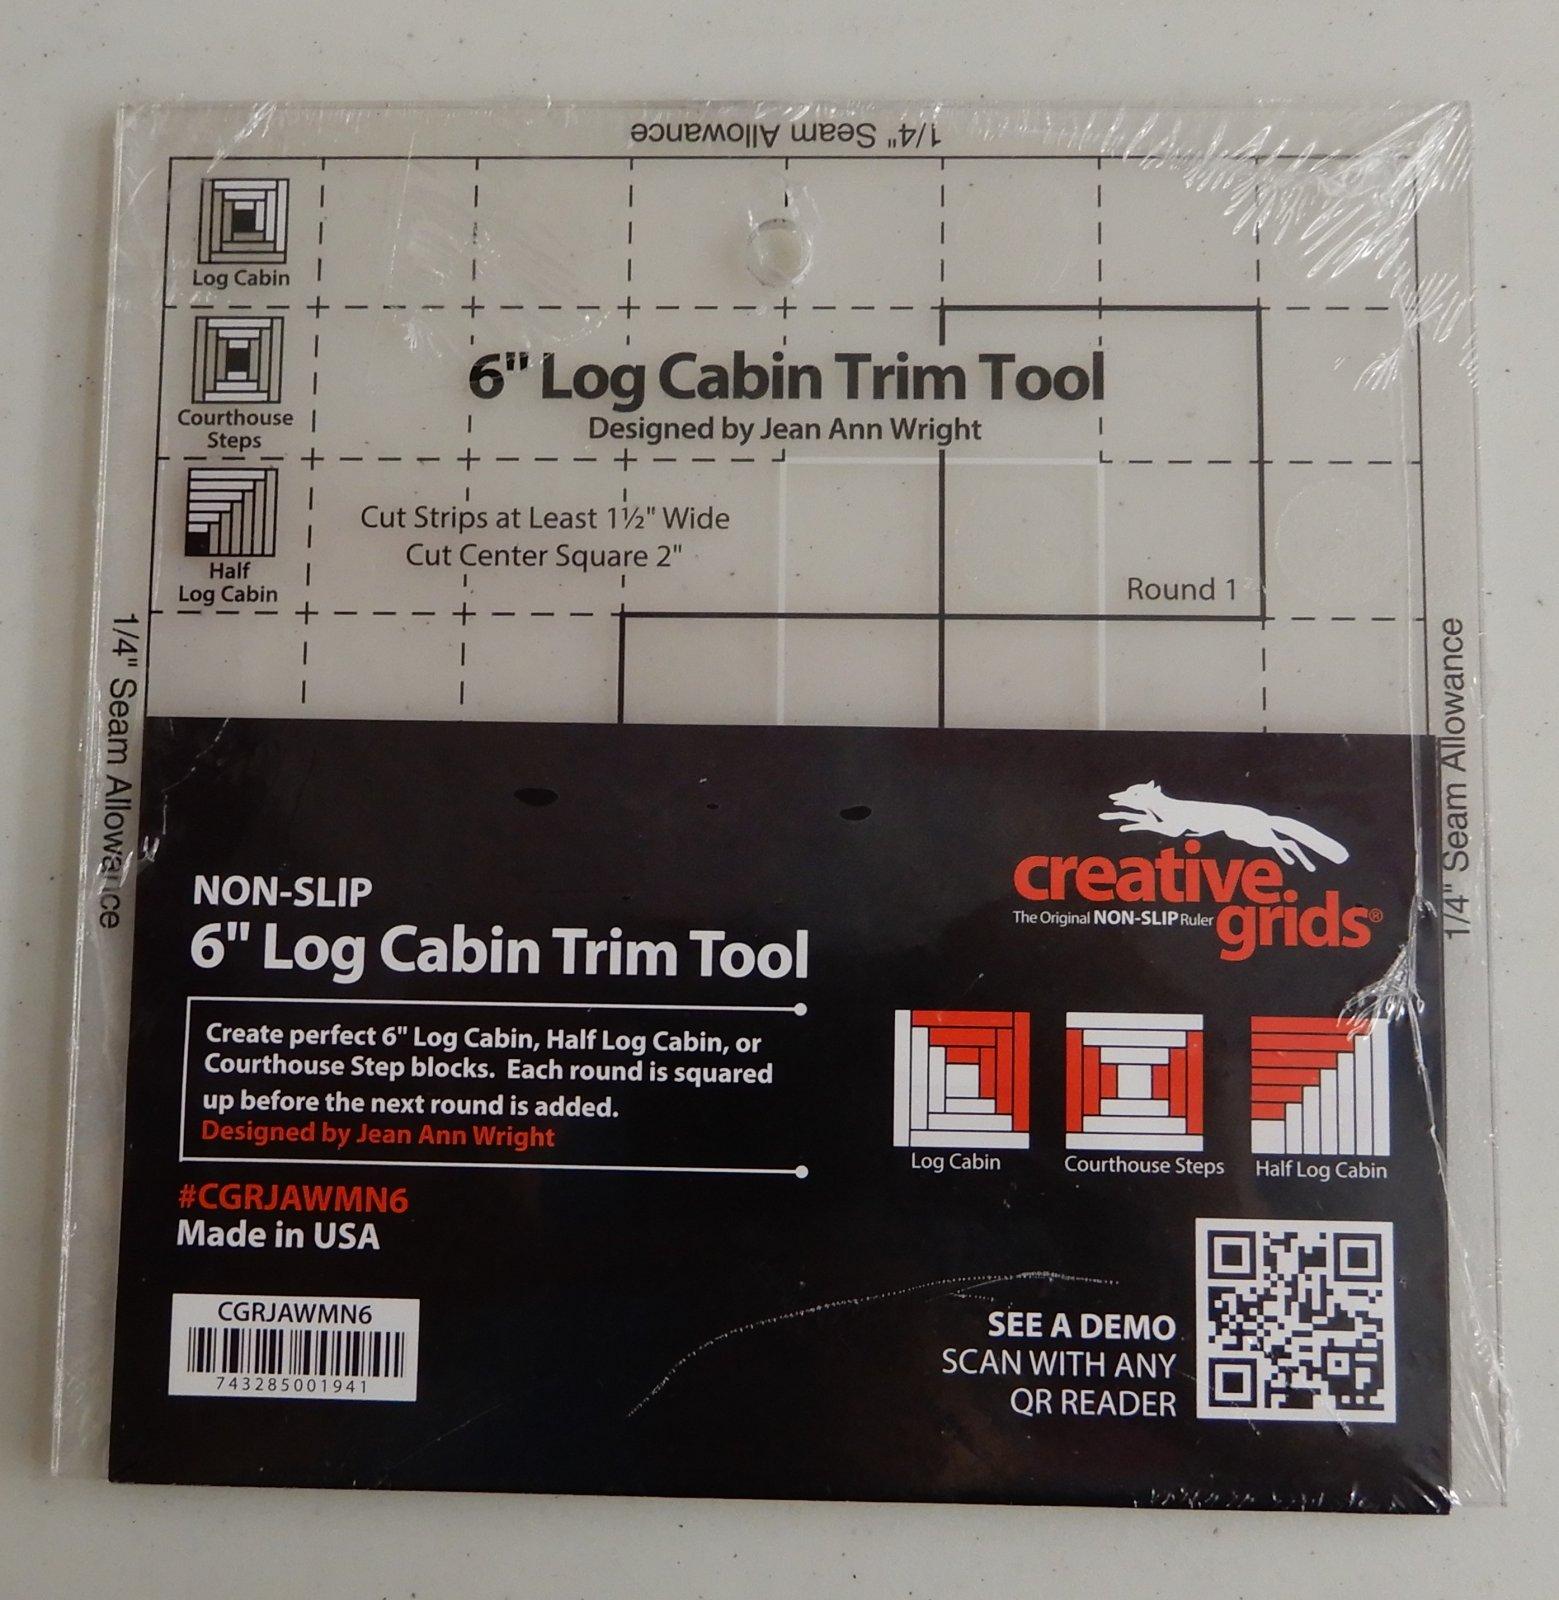 Creative Grids 6 Log Cabin Trim Tool -